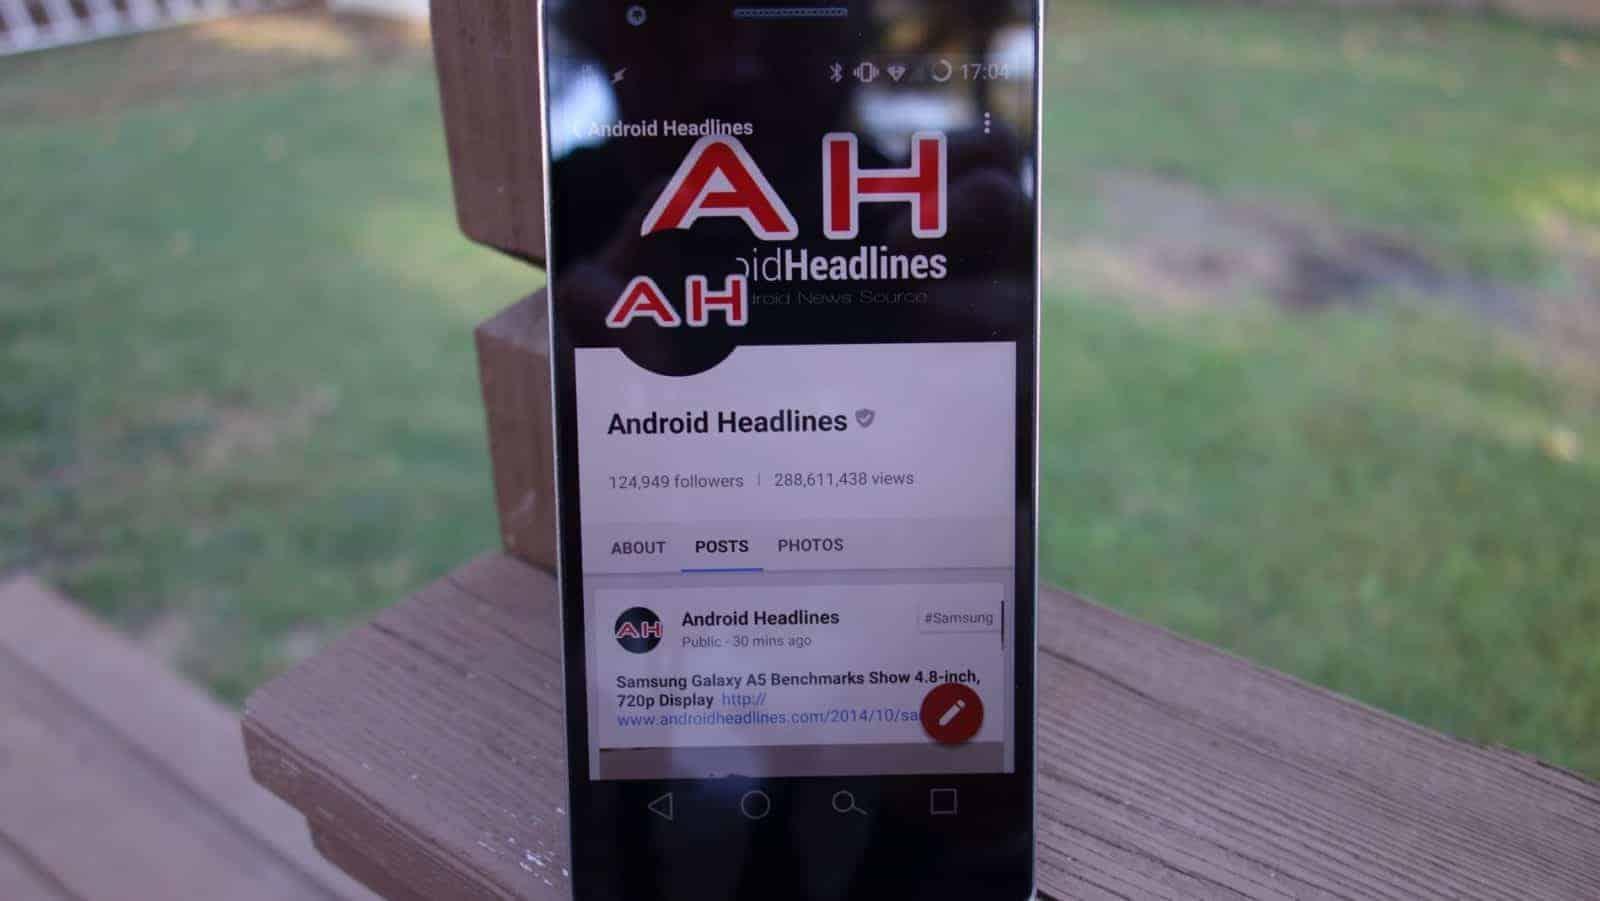 google+ google plus ah android headlines podcast